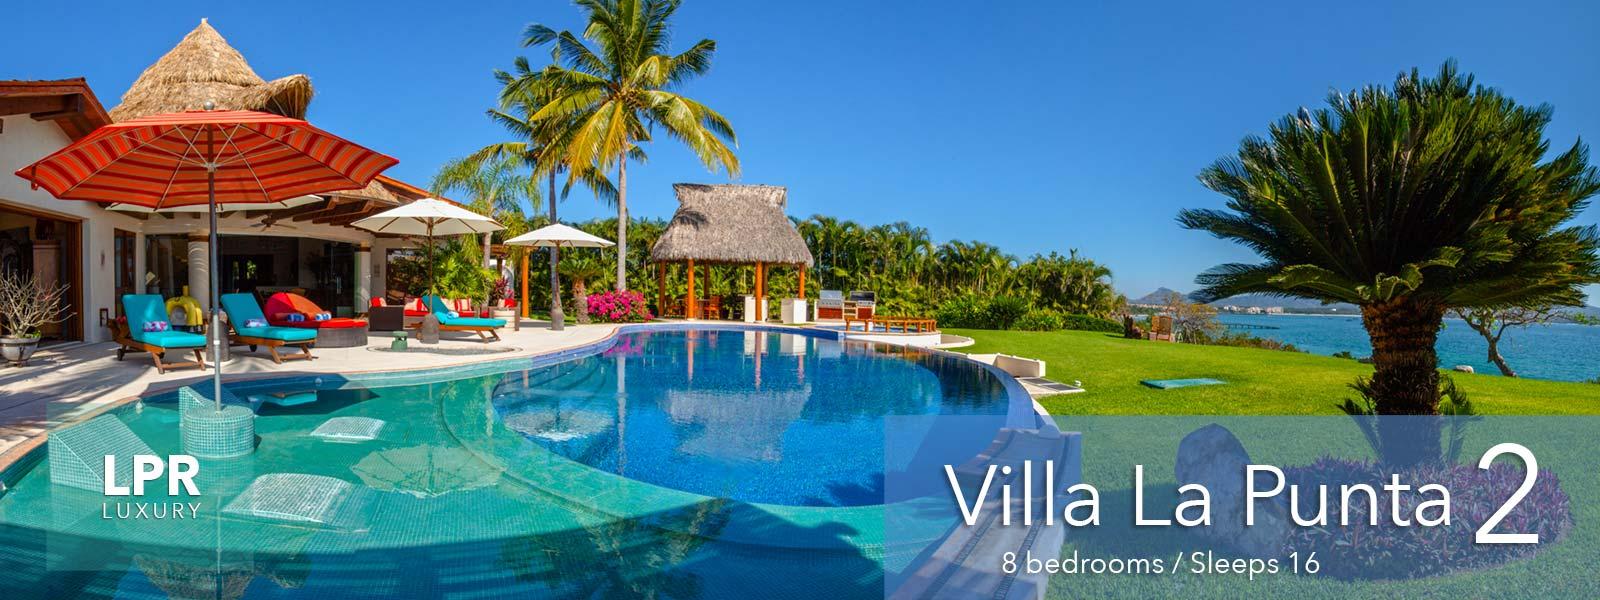 Villa La Punta 2 - Luxury Punta Mita Vacation Villa Rentals - Punta Mita Resort